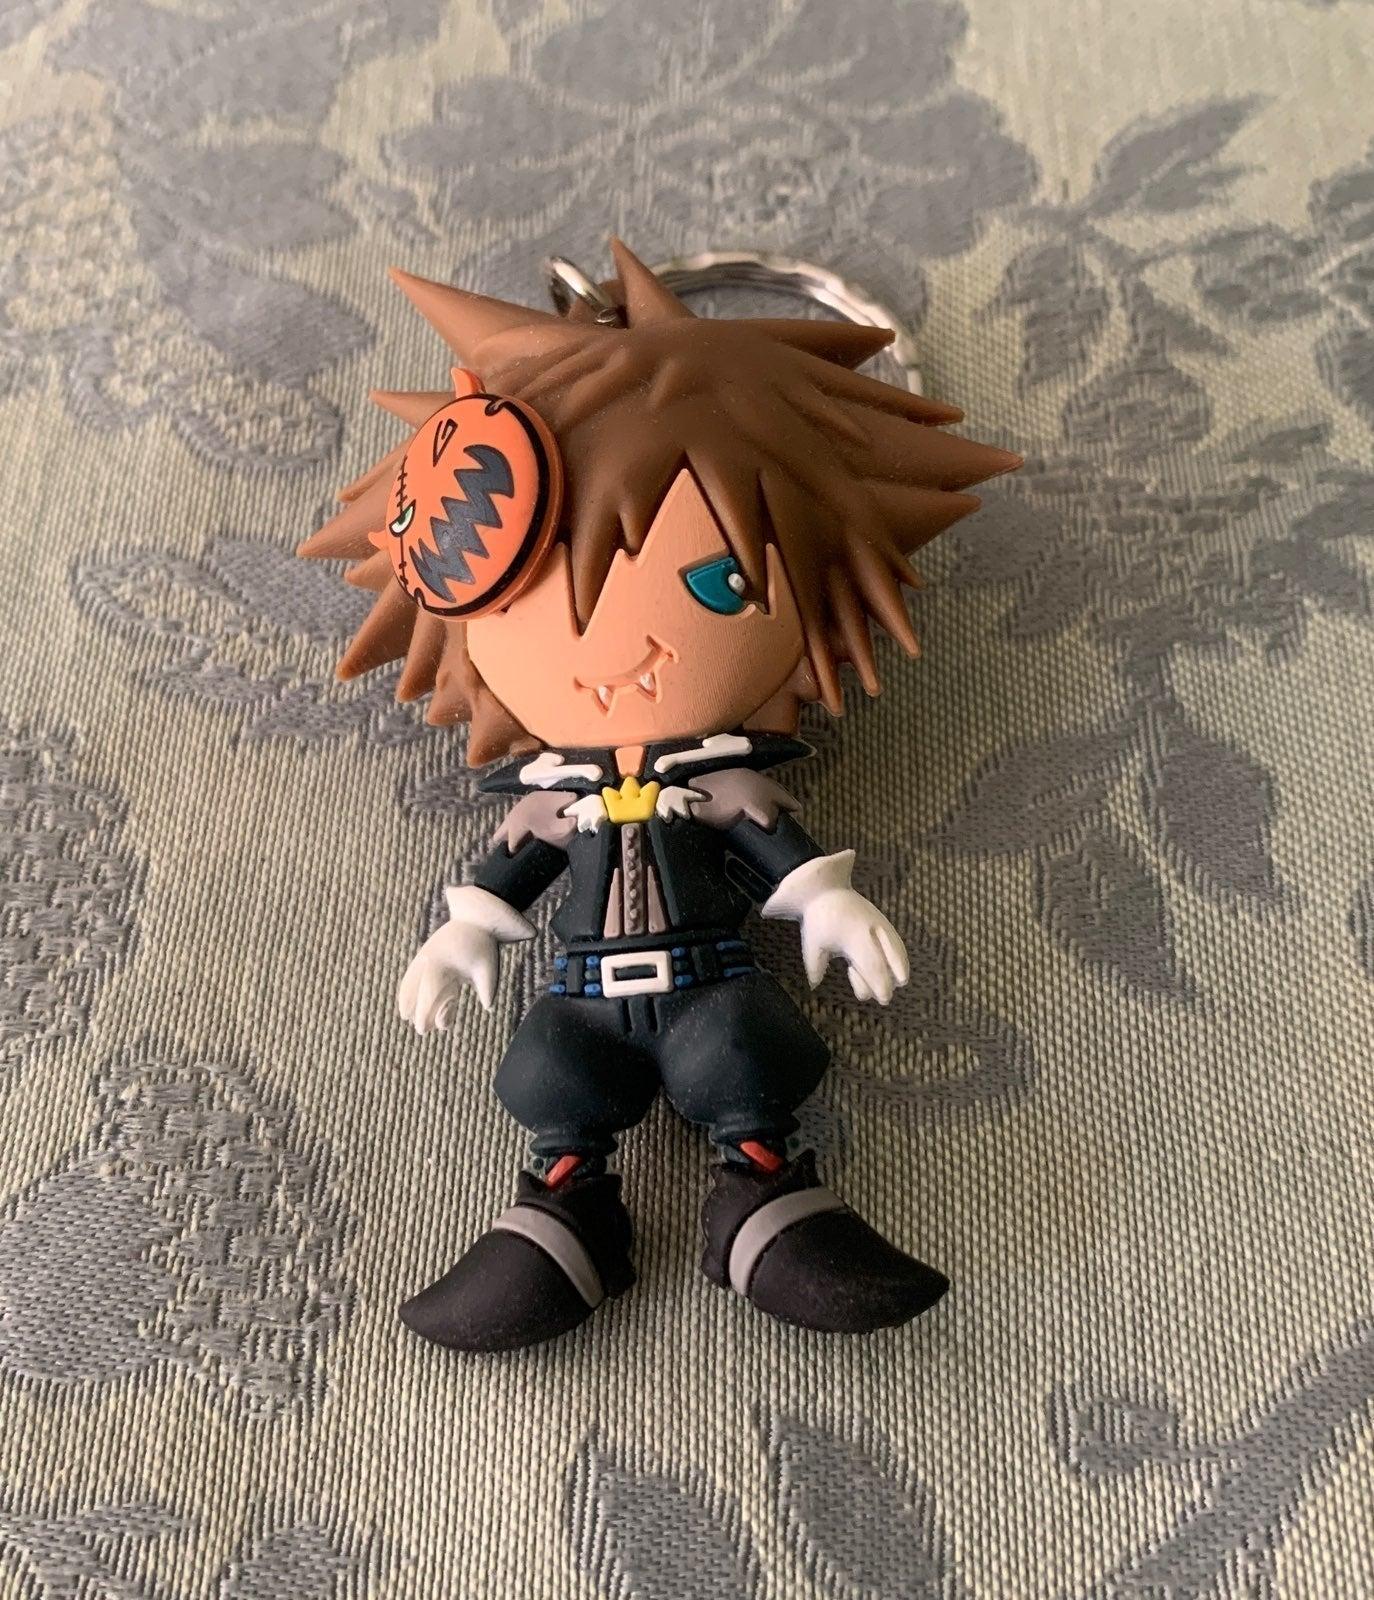 Kingdom Hearts Vampire Sora Keychain